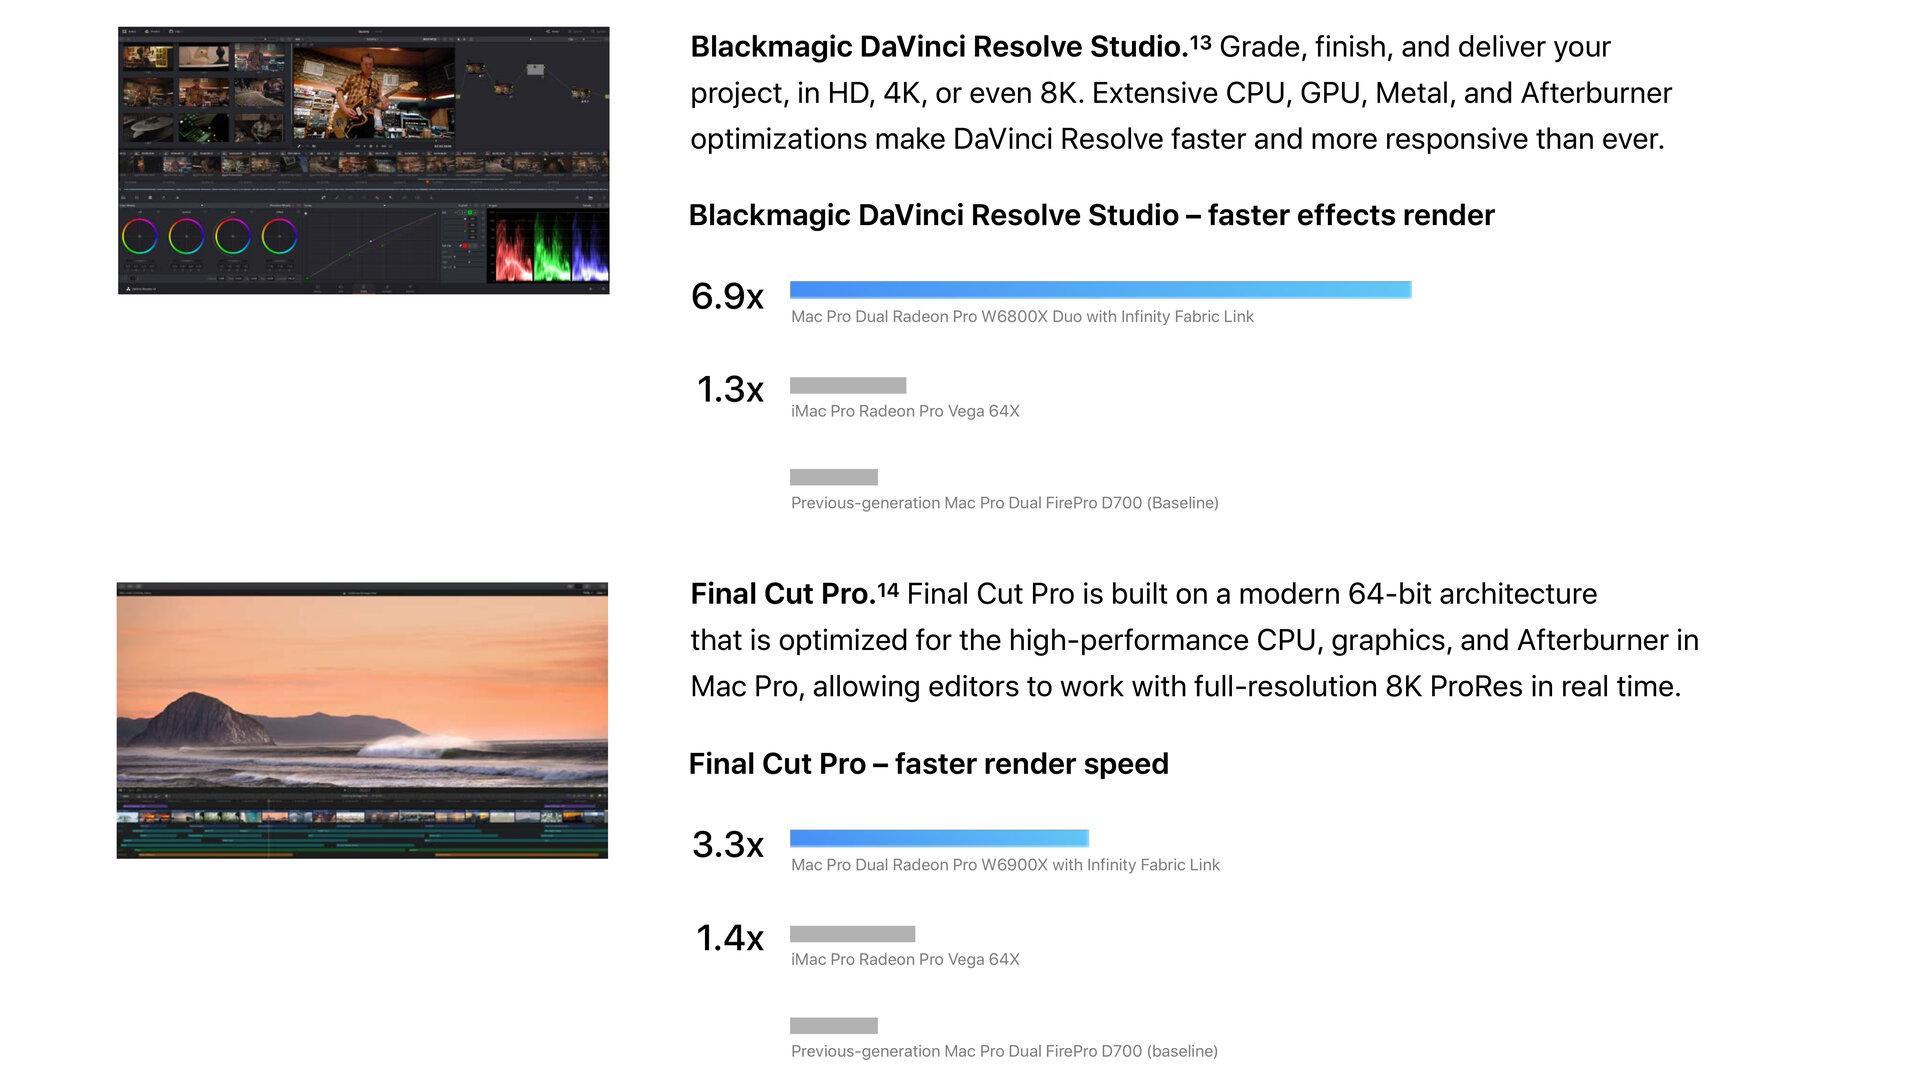 Graphics performance in Blackmagic DaVinci Resolve Studio and Final Cut Pro